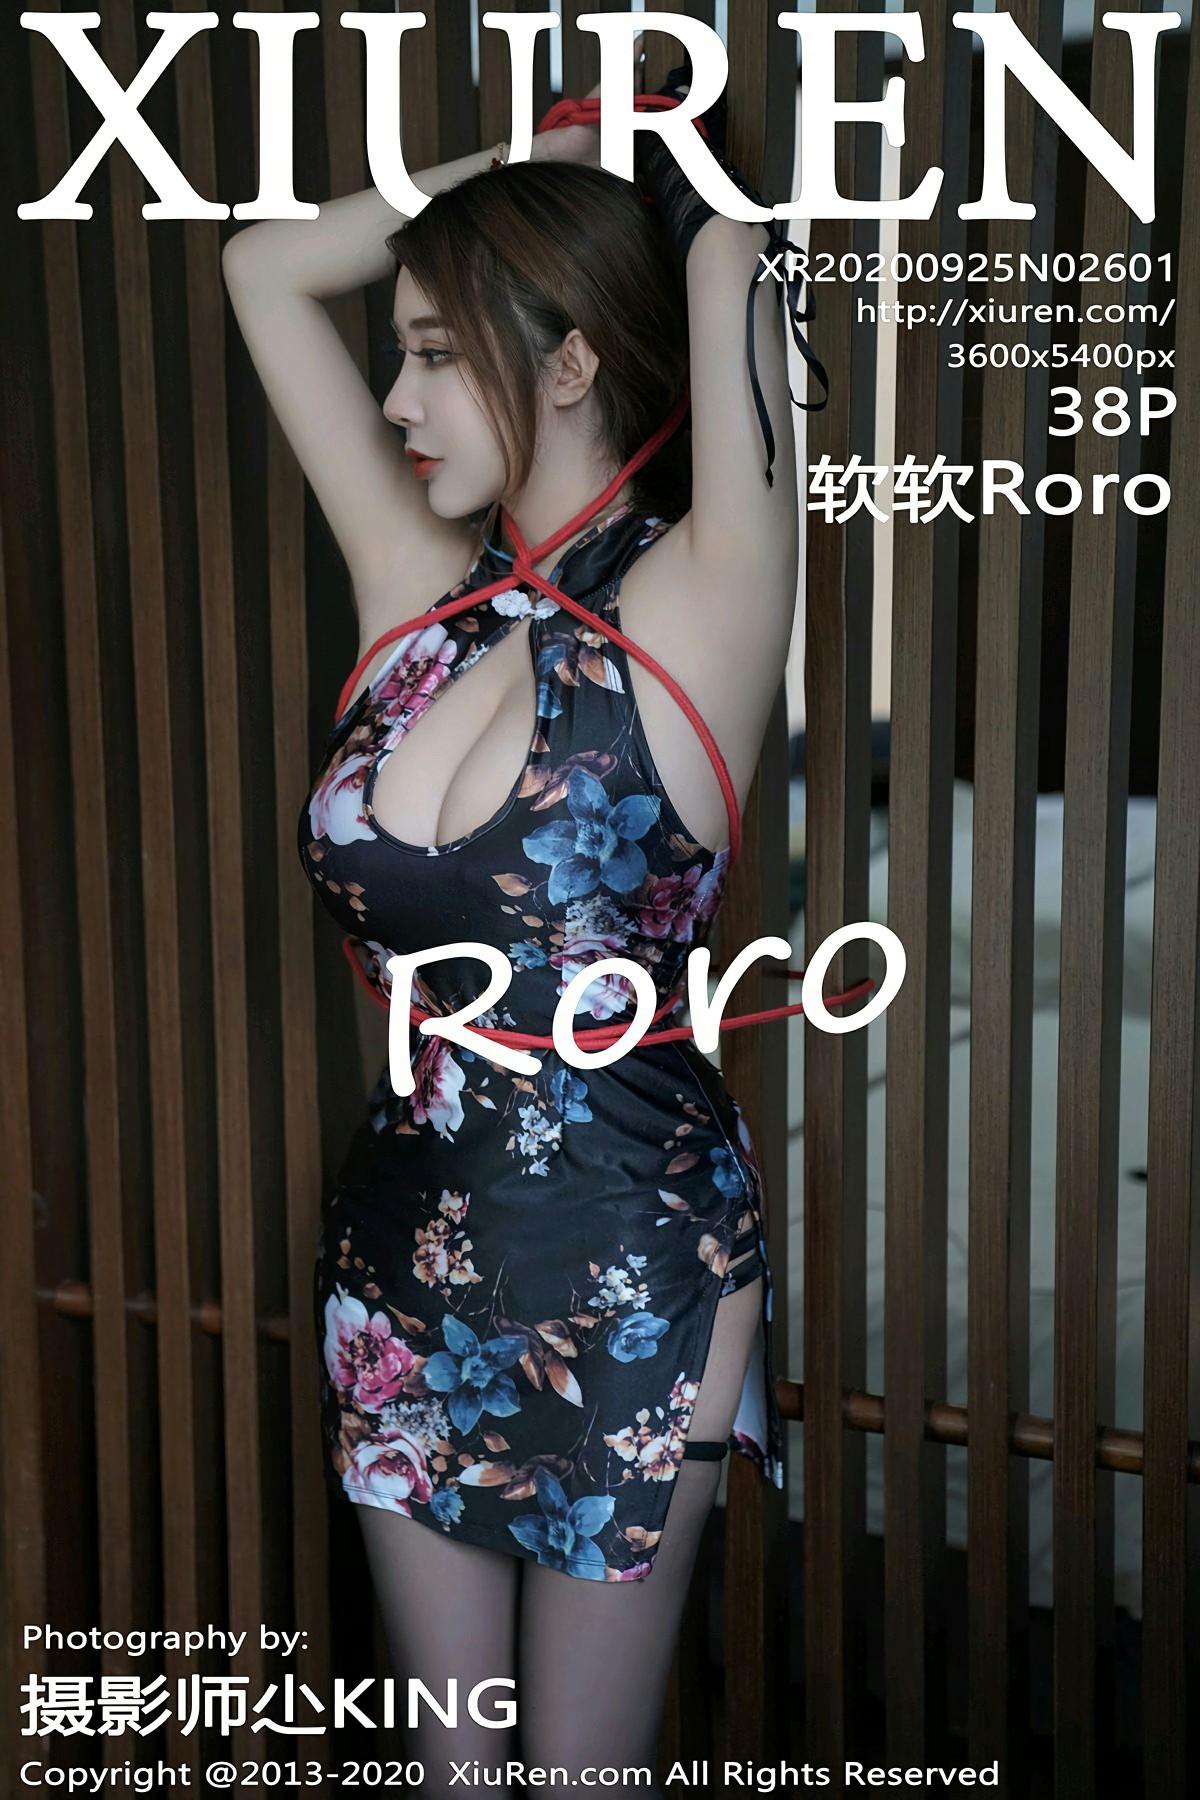 [XiuRen秀人网] 2020.09.25 No.2601 软软Roro 第1张